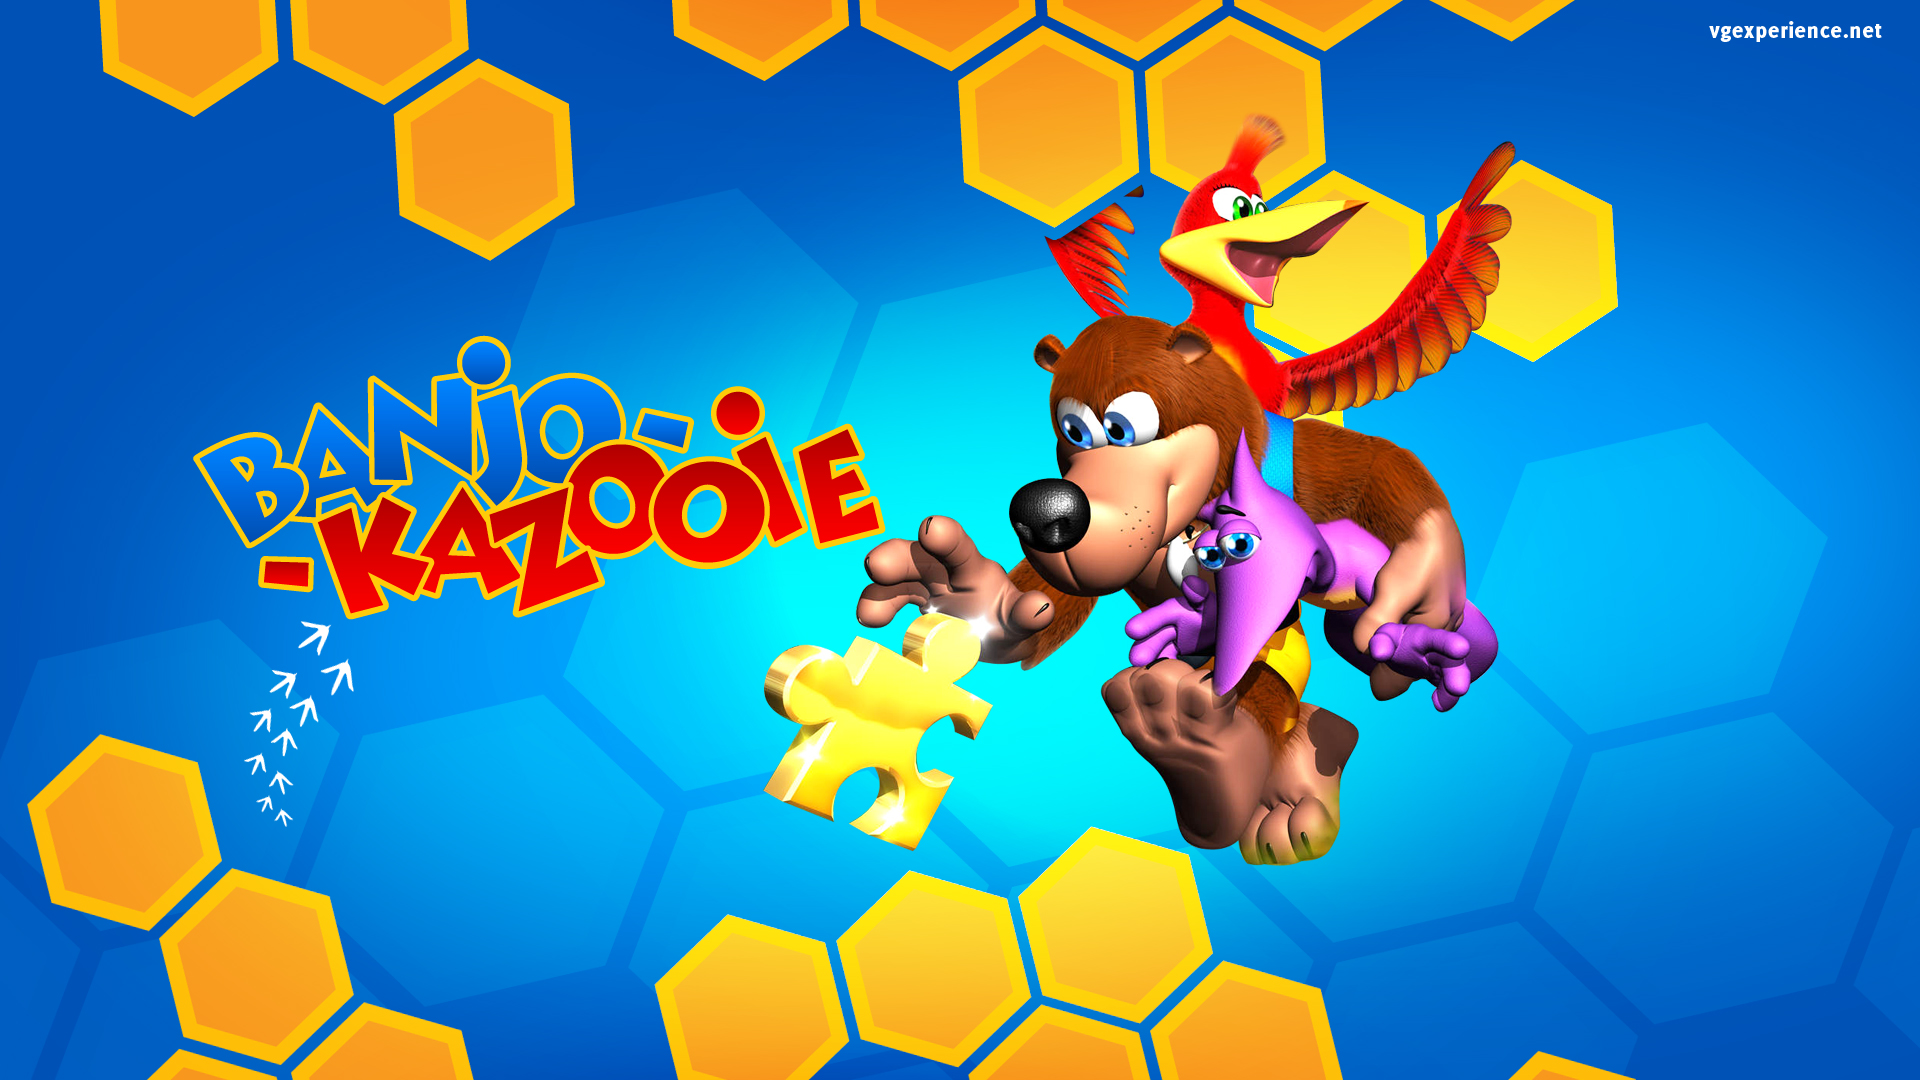 Spiral Wallpaper 3d Banjo Kazooie Details Launchbox Games Database